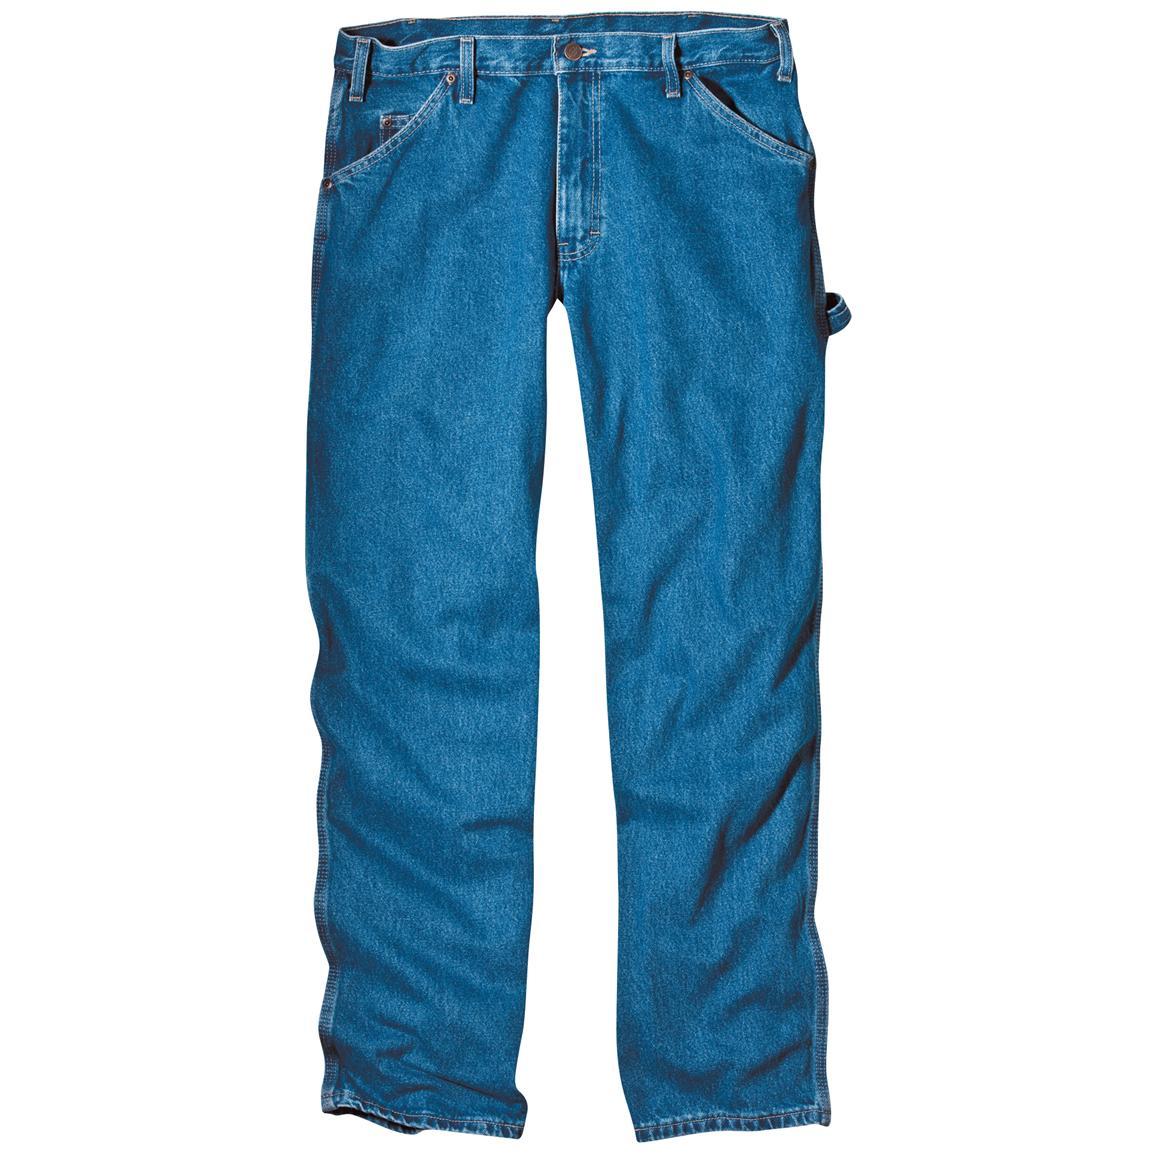 Jeans clipart NiceClipart clipart com Jeans art